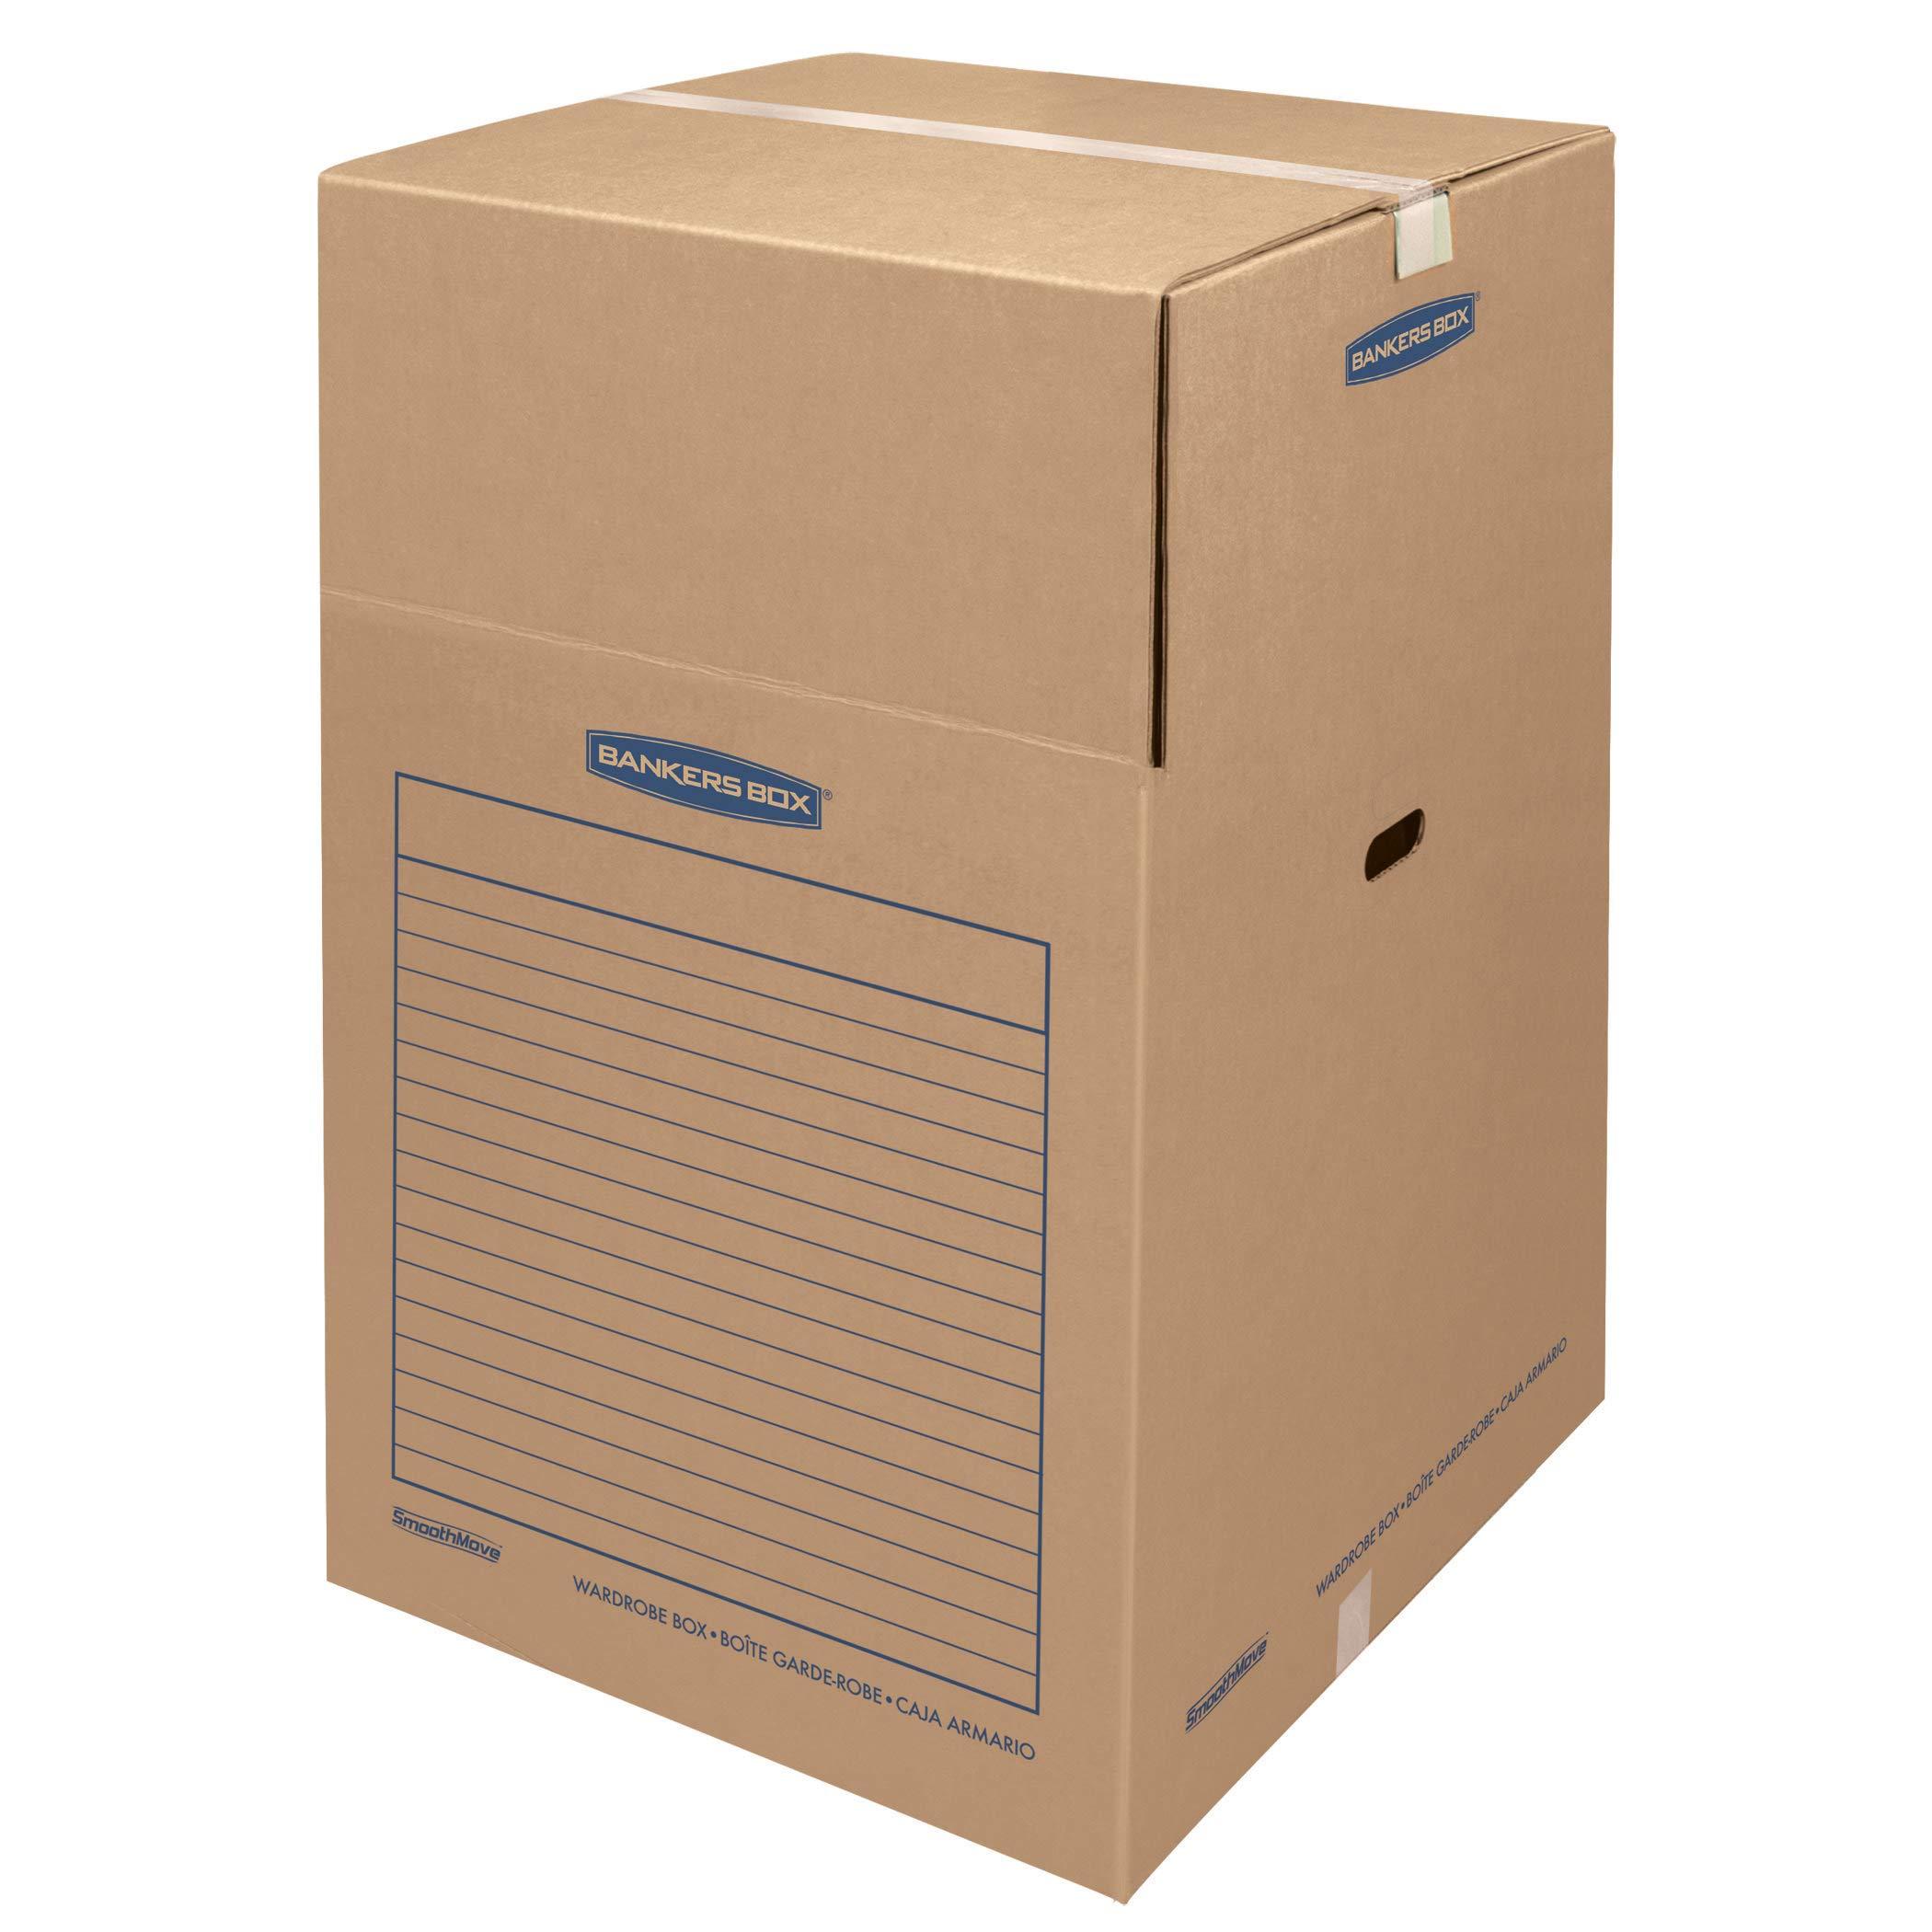 Bankers Box SmoothMove Wardrobe Box Large, 3 Pack (8811001)